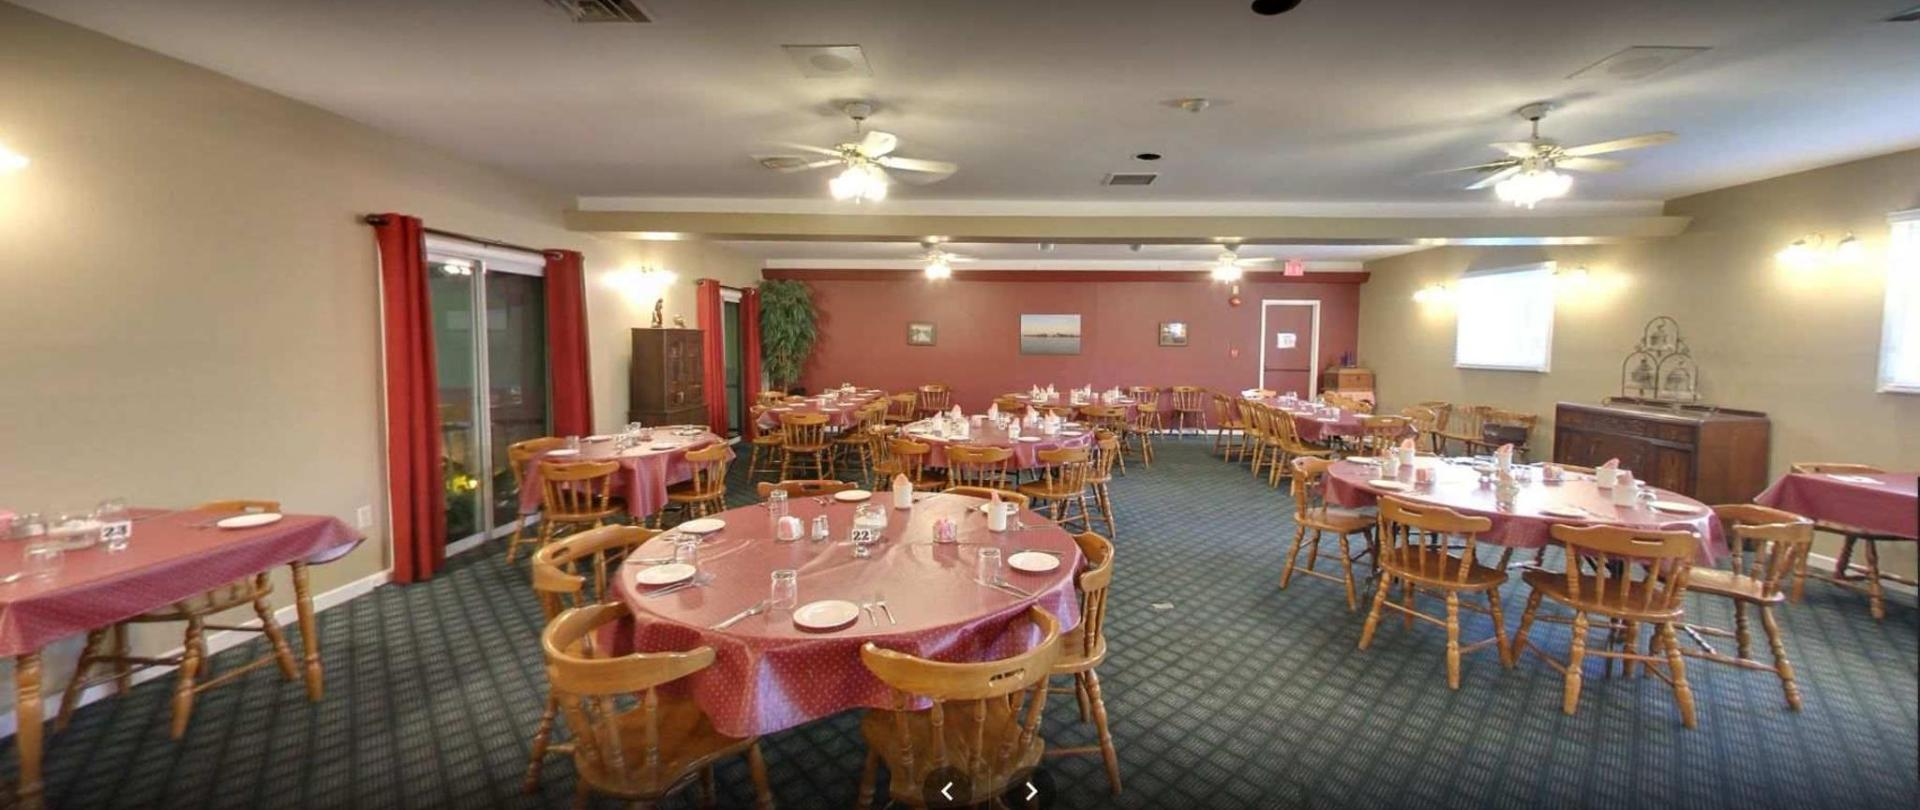 colonial dining 1.JPG